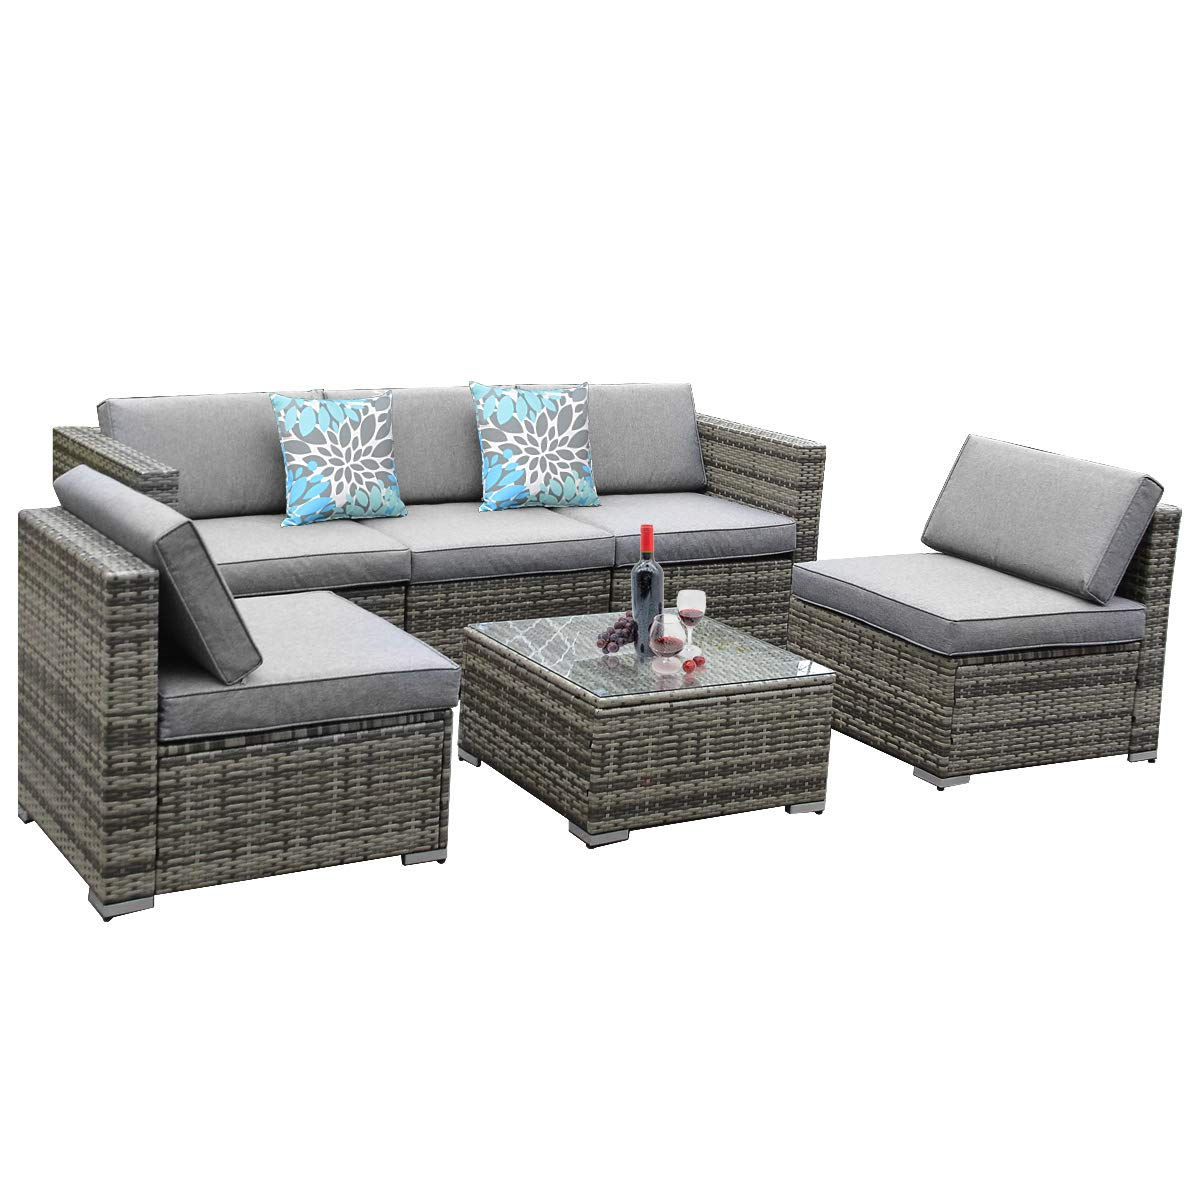 YITAHOME 6 Piece Outdoor Patio Furniture Sets, Garden Conversation Wicker Sofa Set, and Patio Sectional Furniture Sofa Set...